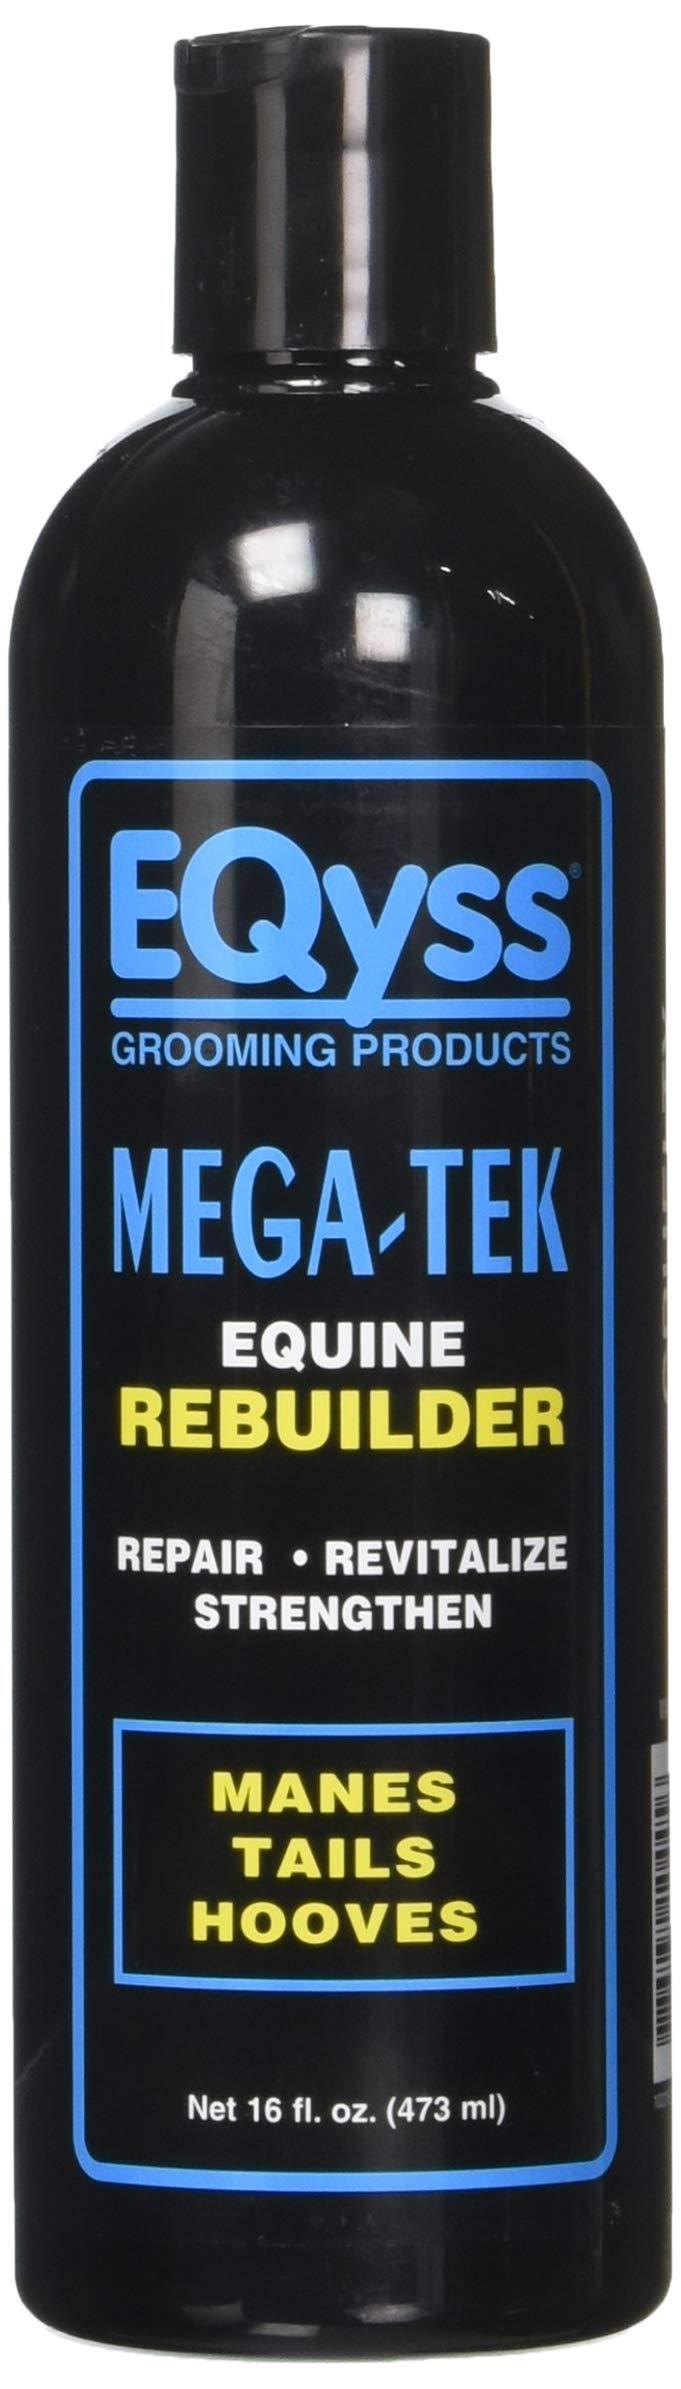 Eqyss Mega-Tek Rebuilder 16 oz by Eqyss